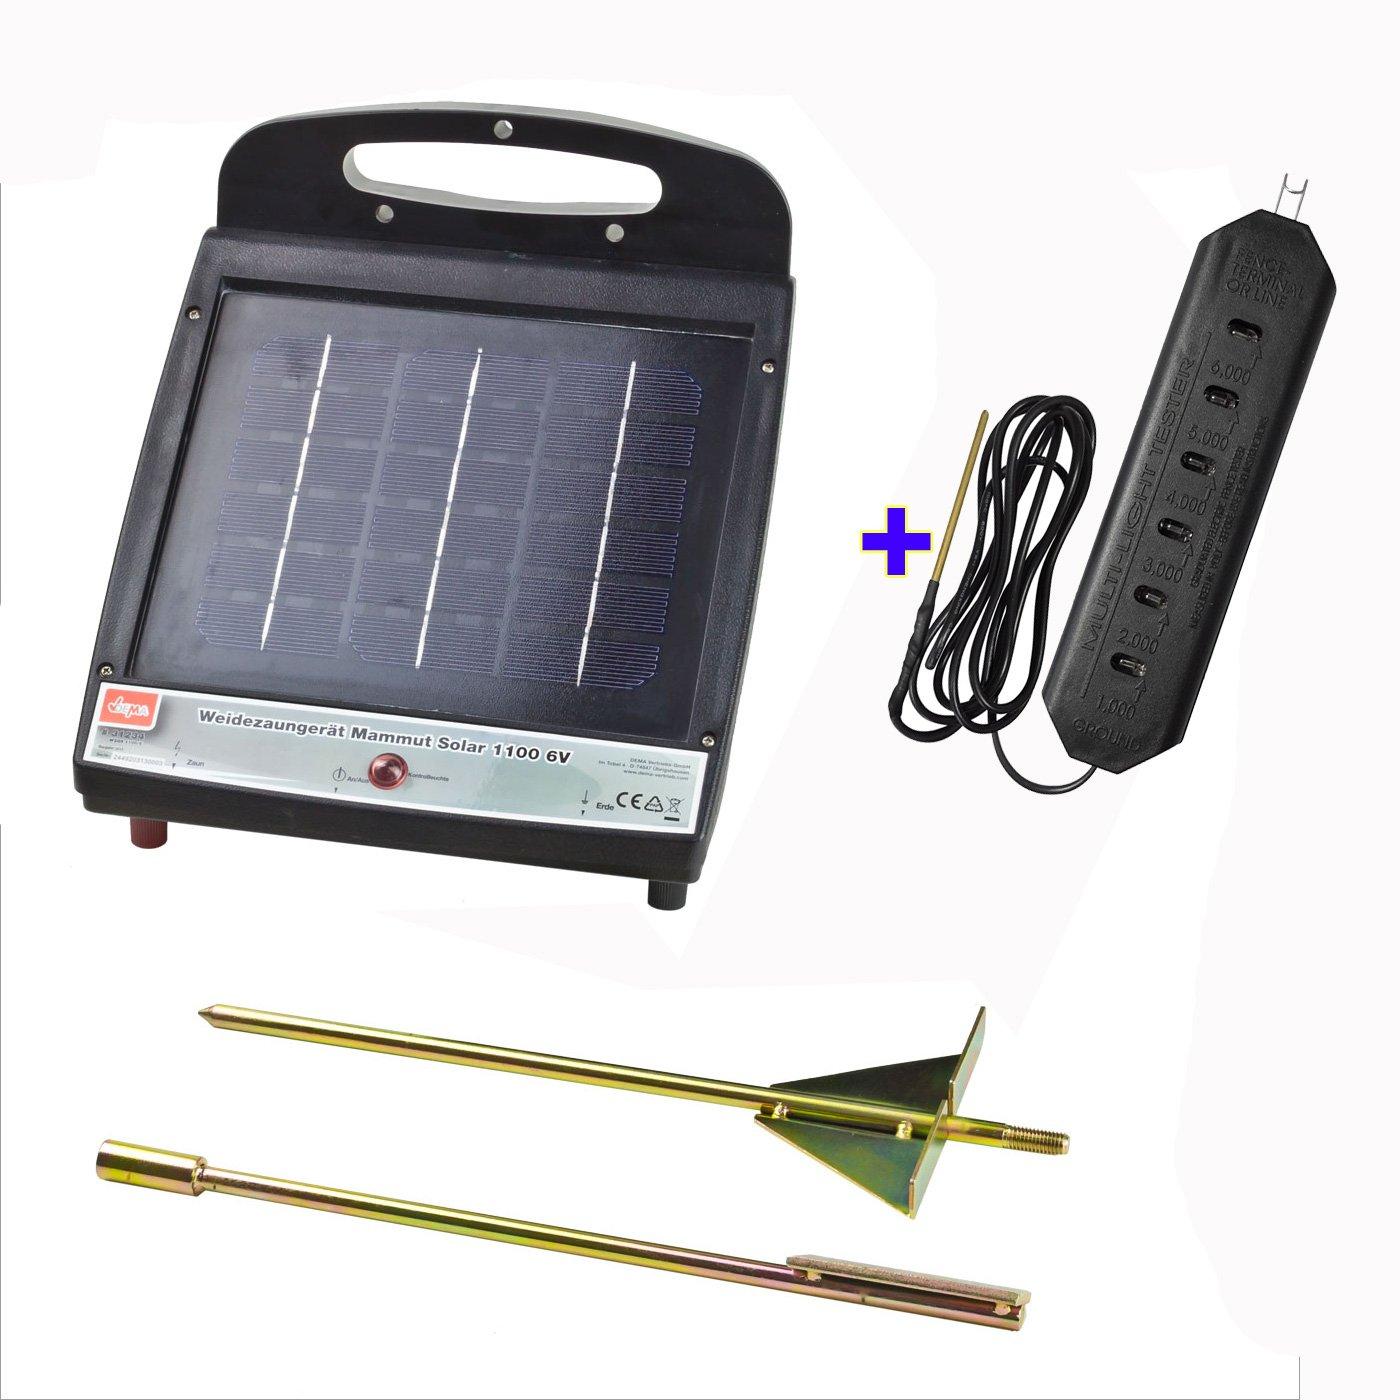 Weidezaungerät Mammut Solar 1100 6V inkl. Solarpanel & Akku PLUS Zaunprüfer